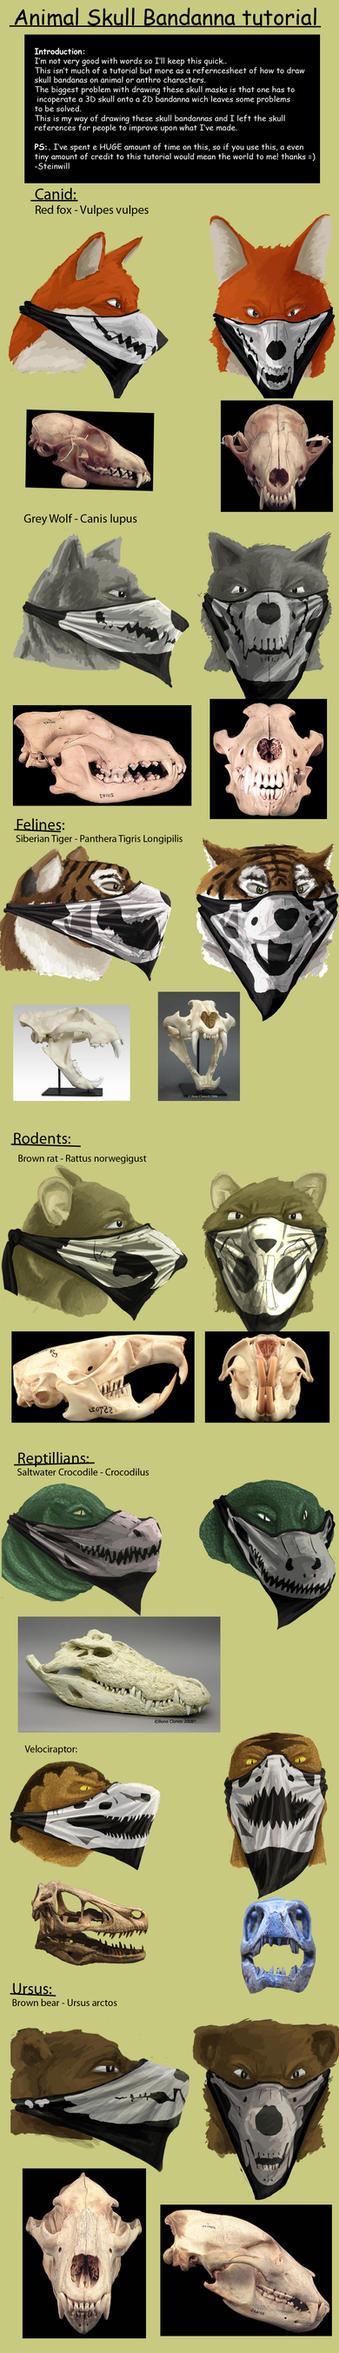 Anthro Skull Bandanna tutorial by SteinWill